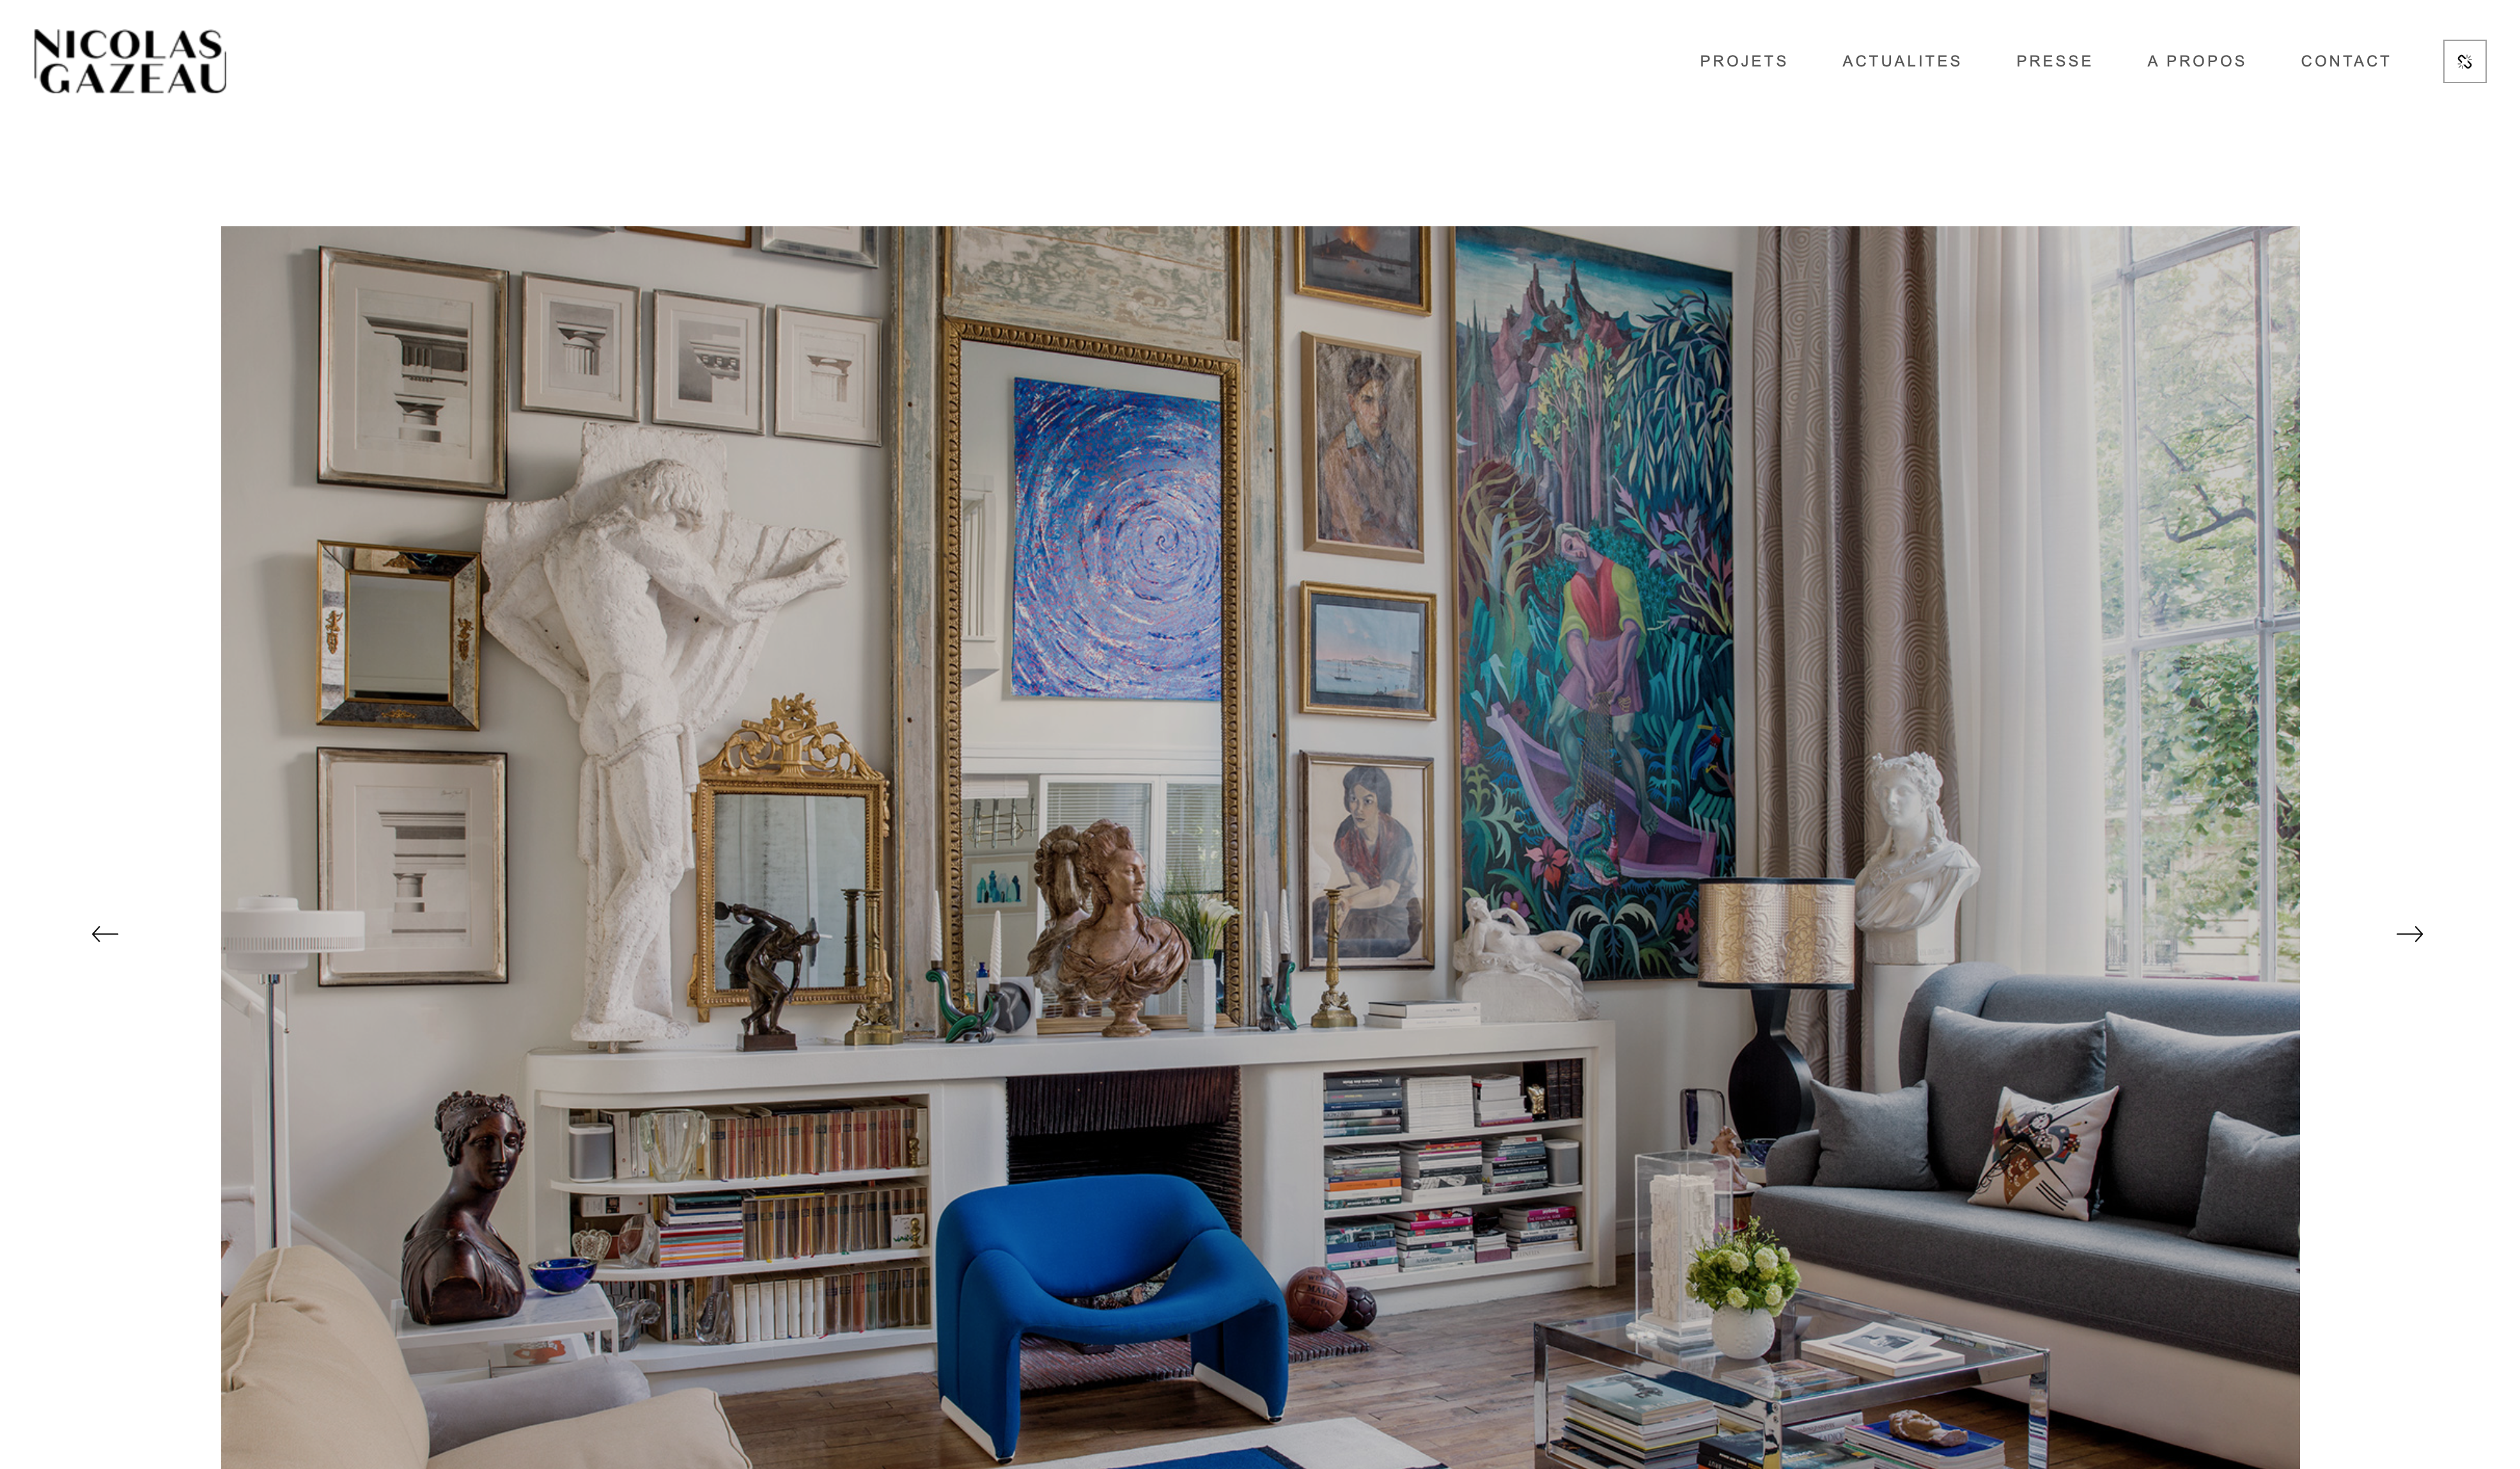 nicolas gazeau_studio421 home